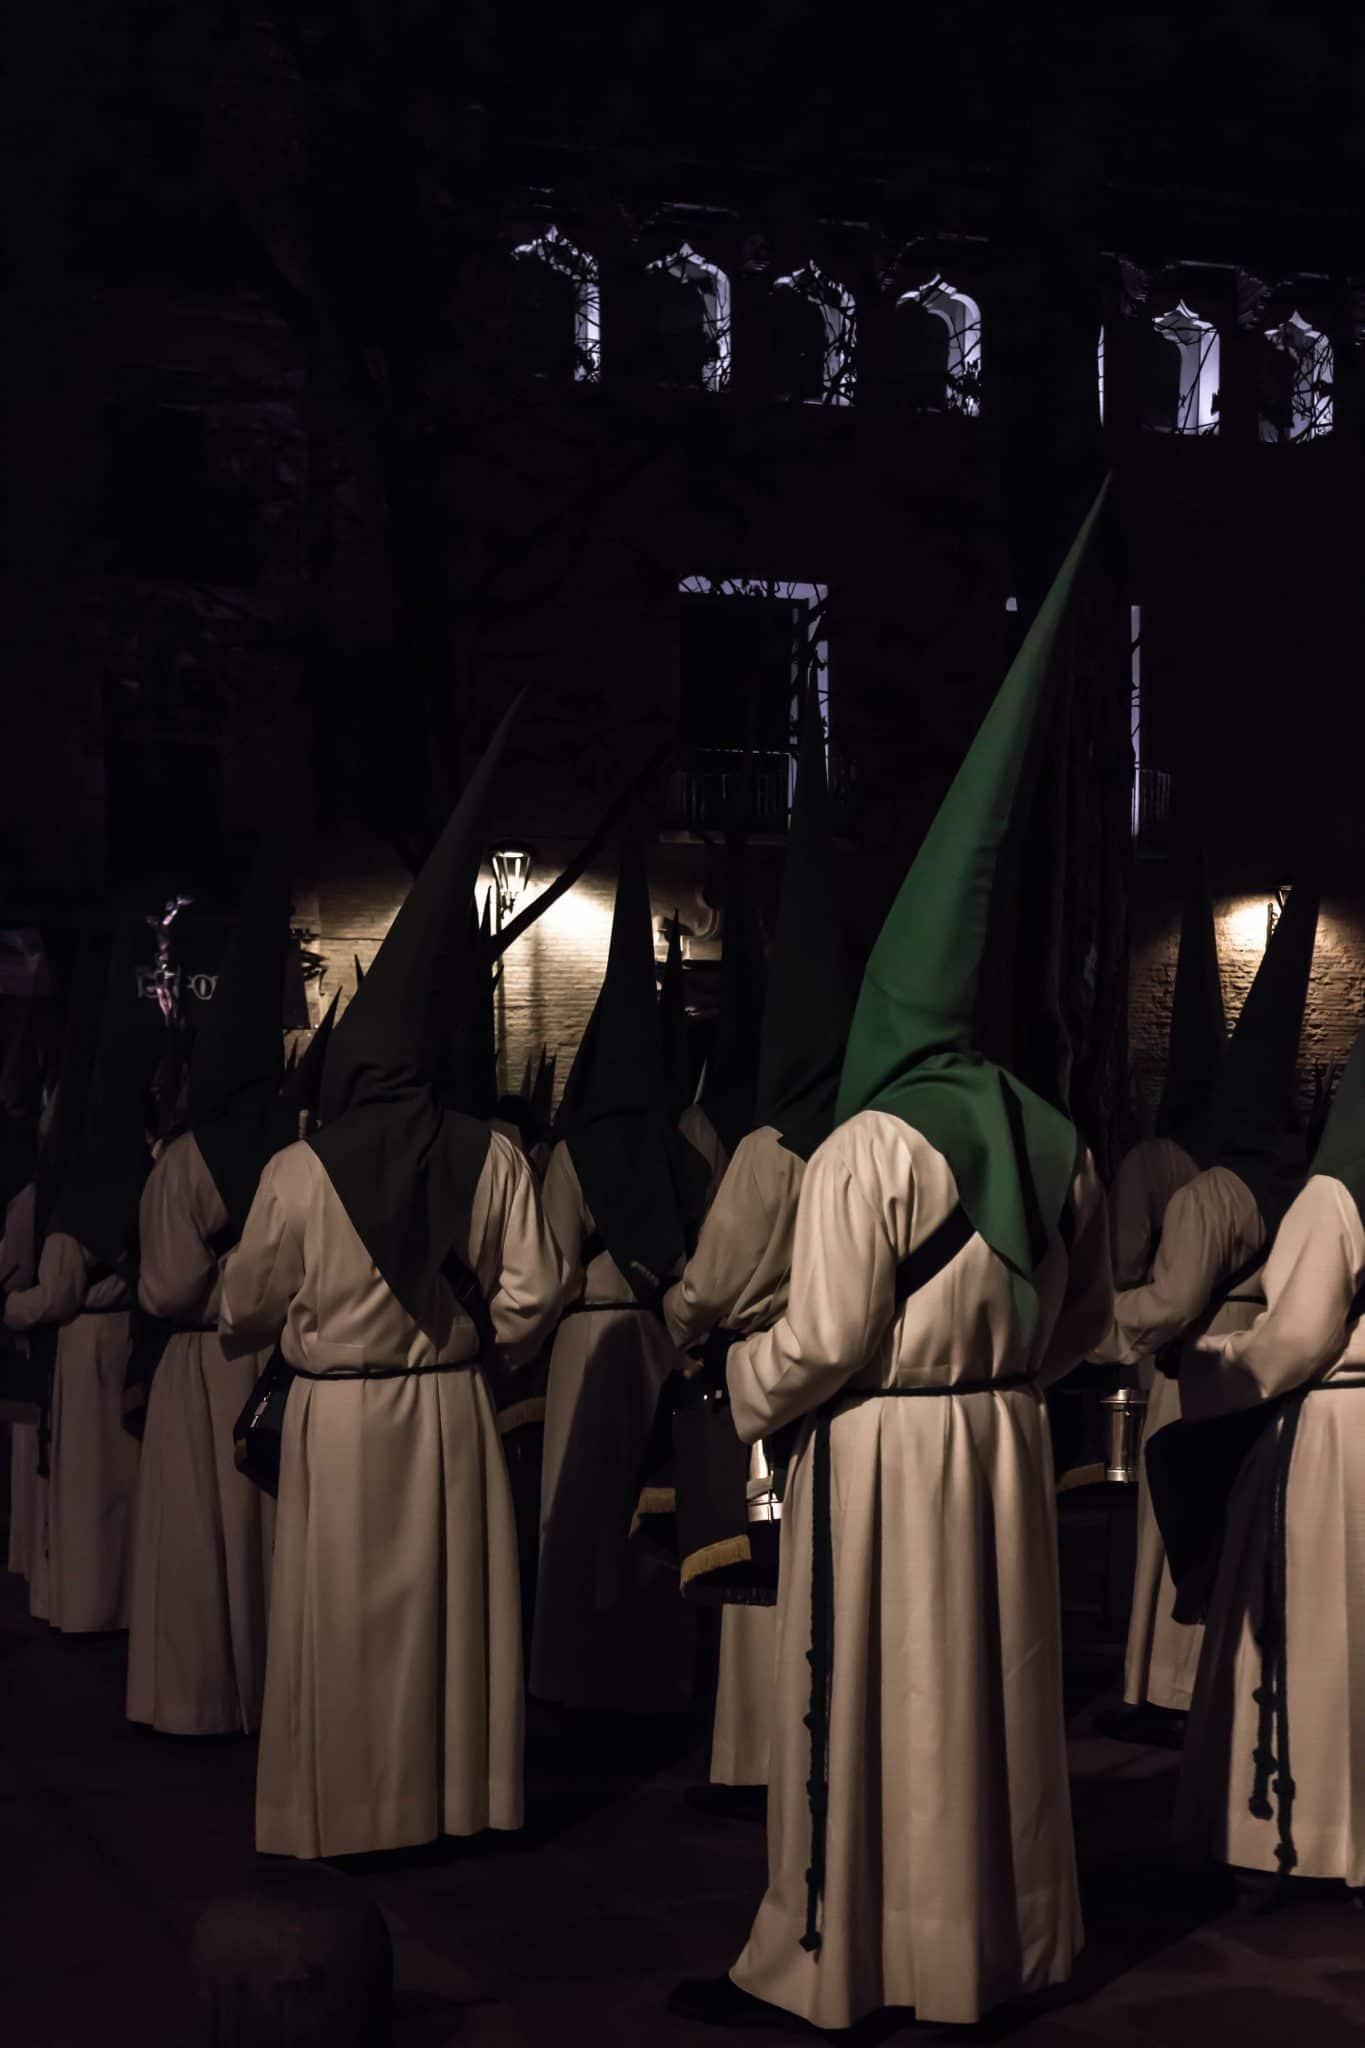 Semana Santa en Zaragoza - Via Crucis Siete Palabras